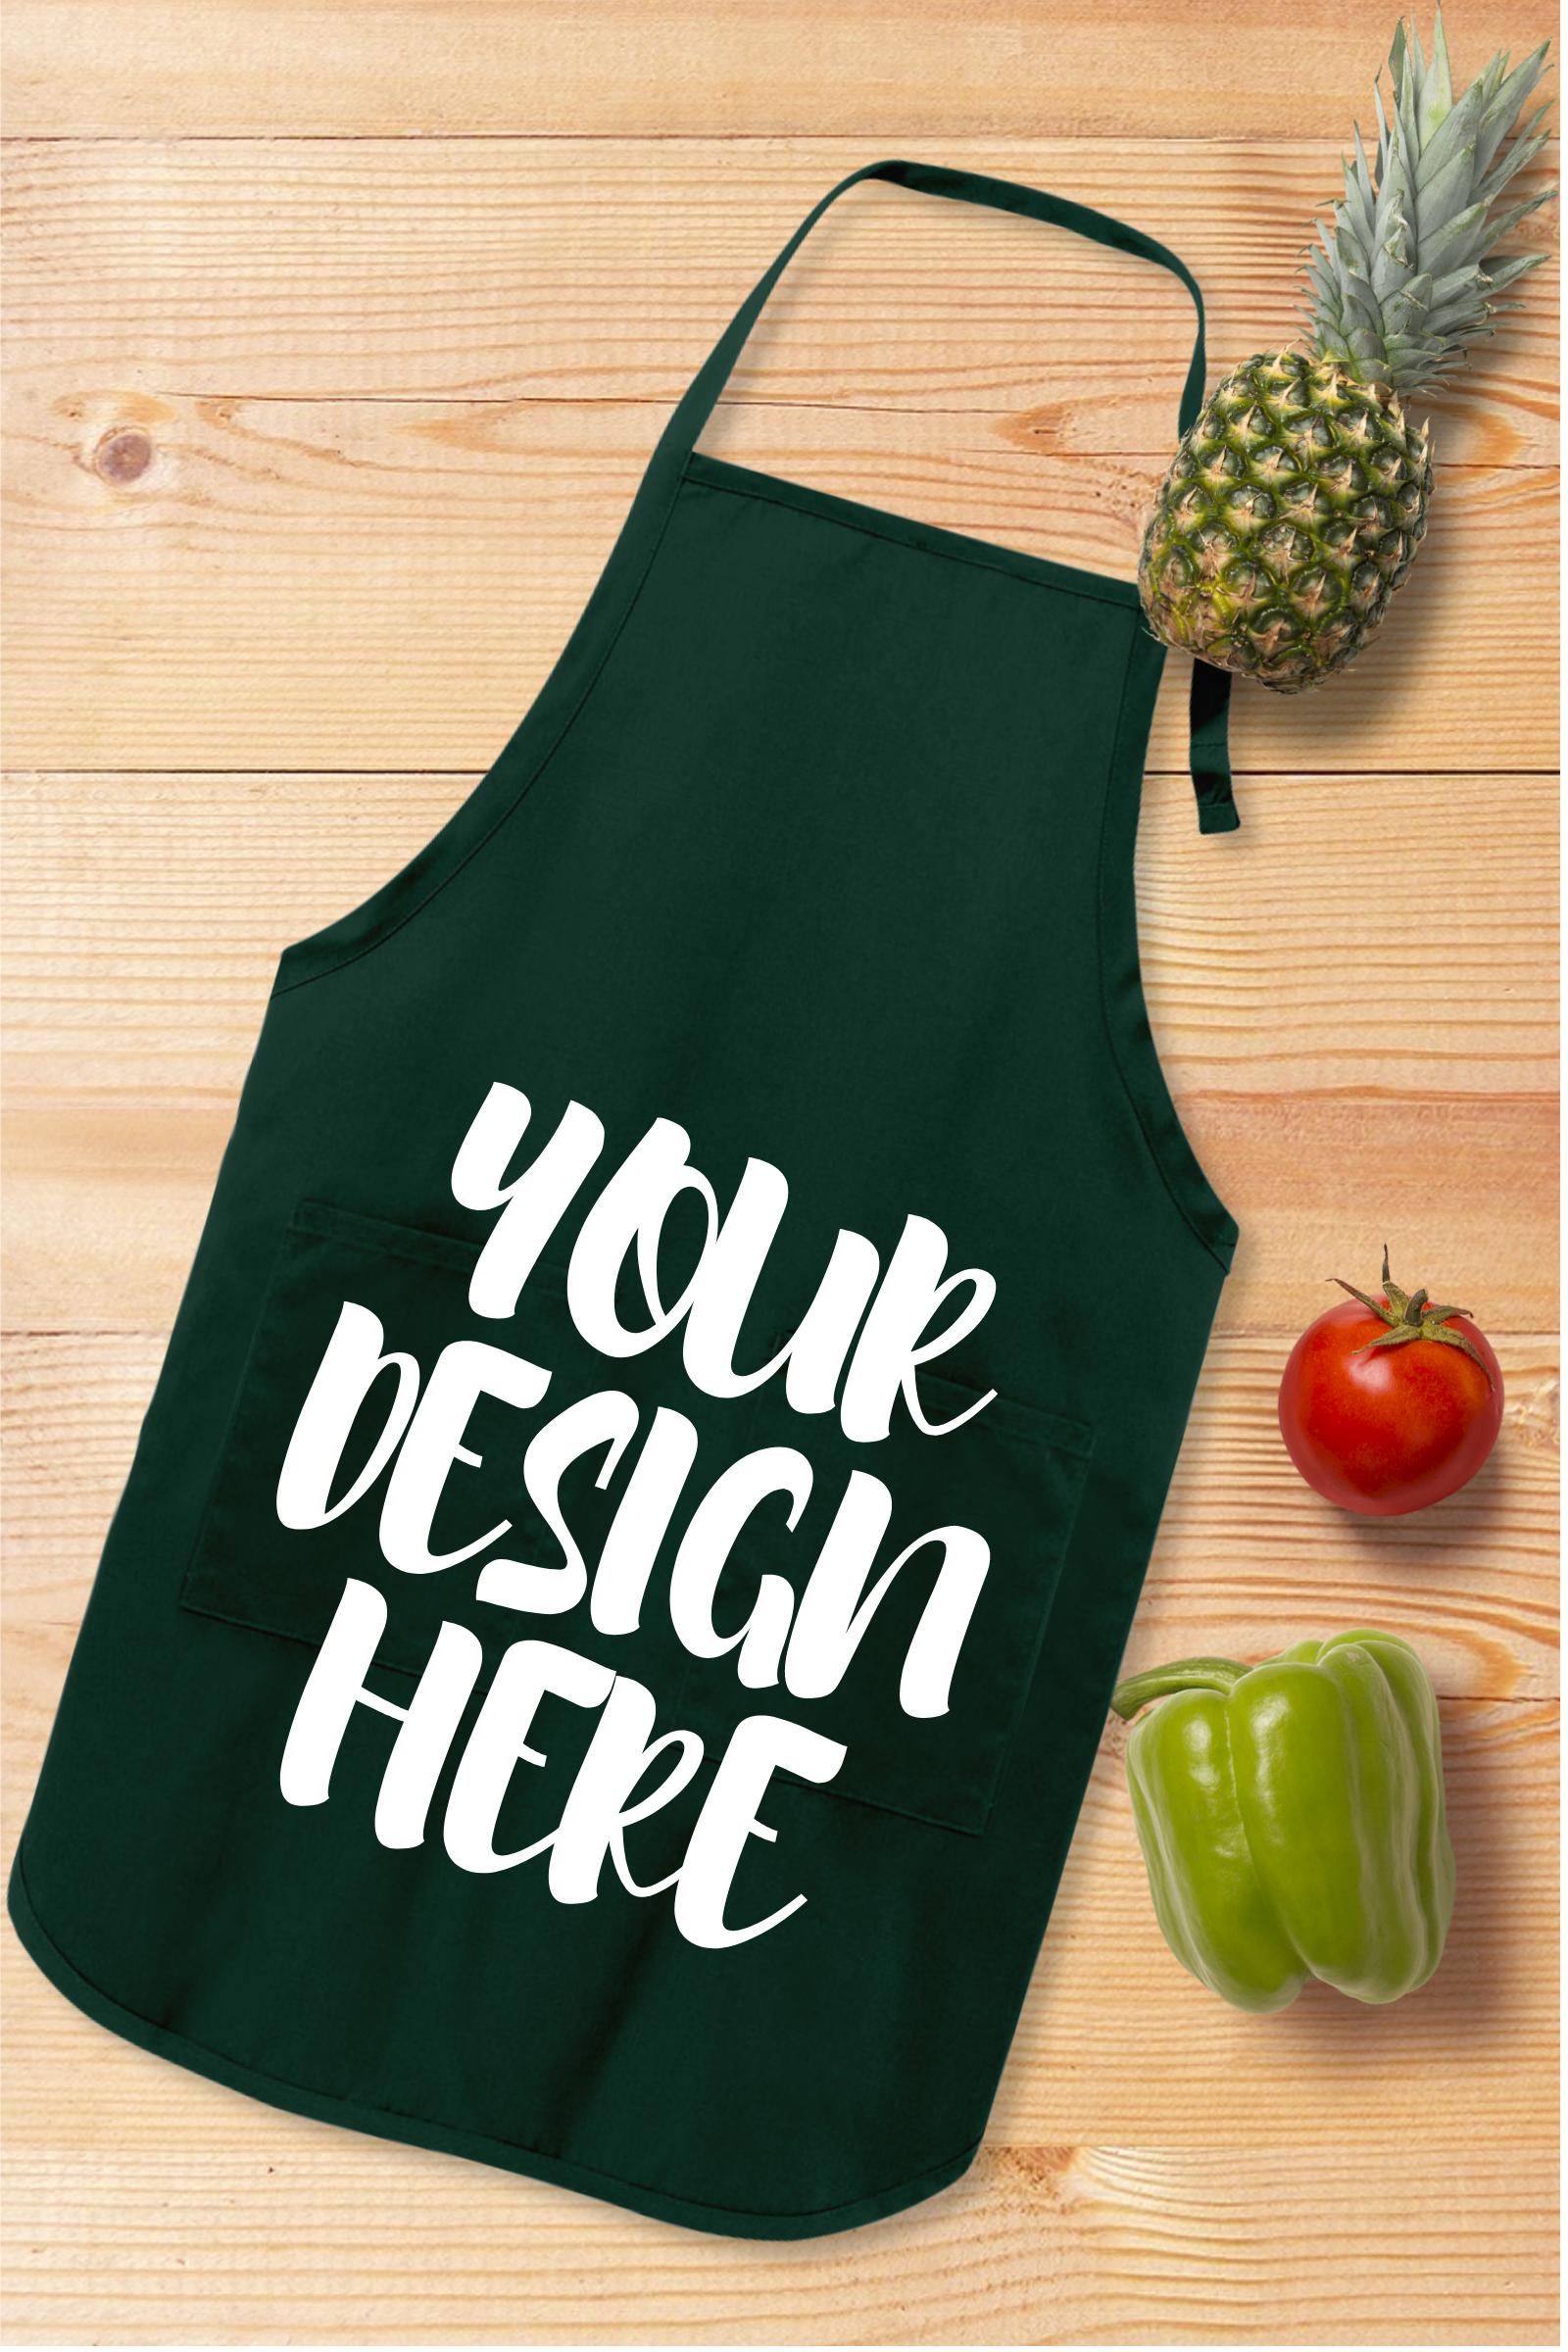 Apron Mock Ups Bundle With Kitchen Theme - 6 example image 4